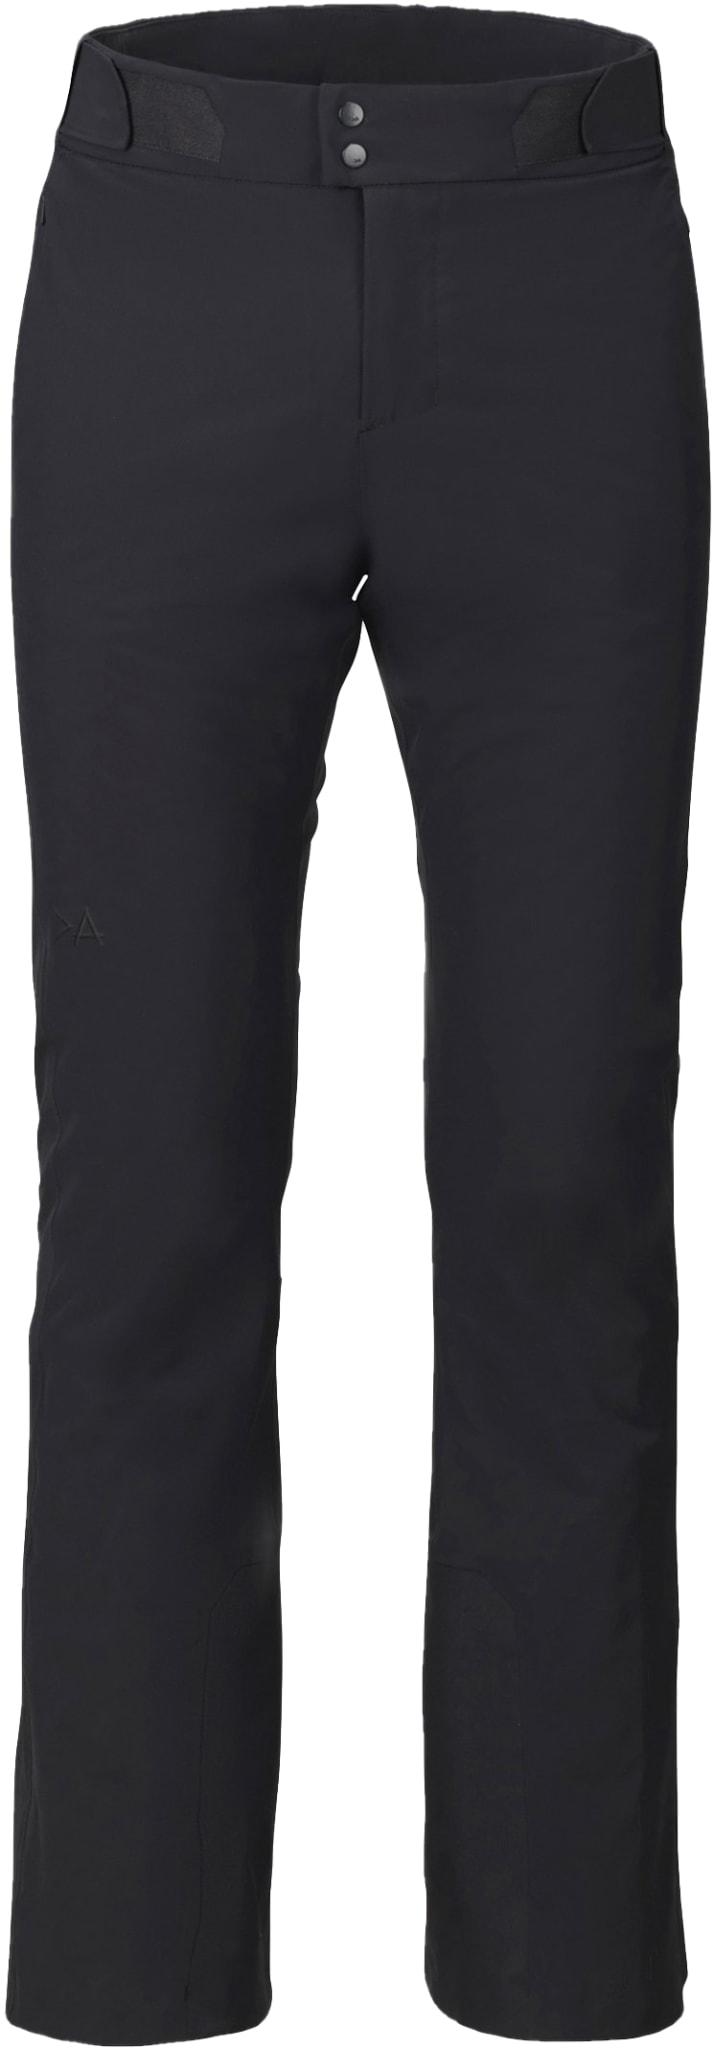 Curve Stretch Pants W